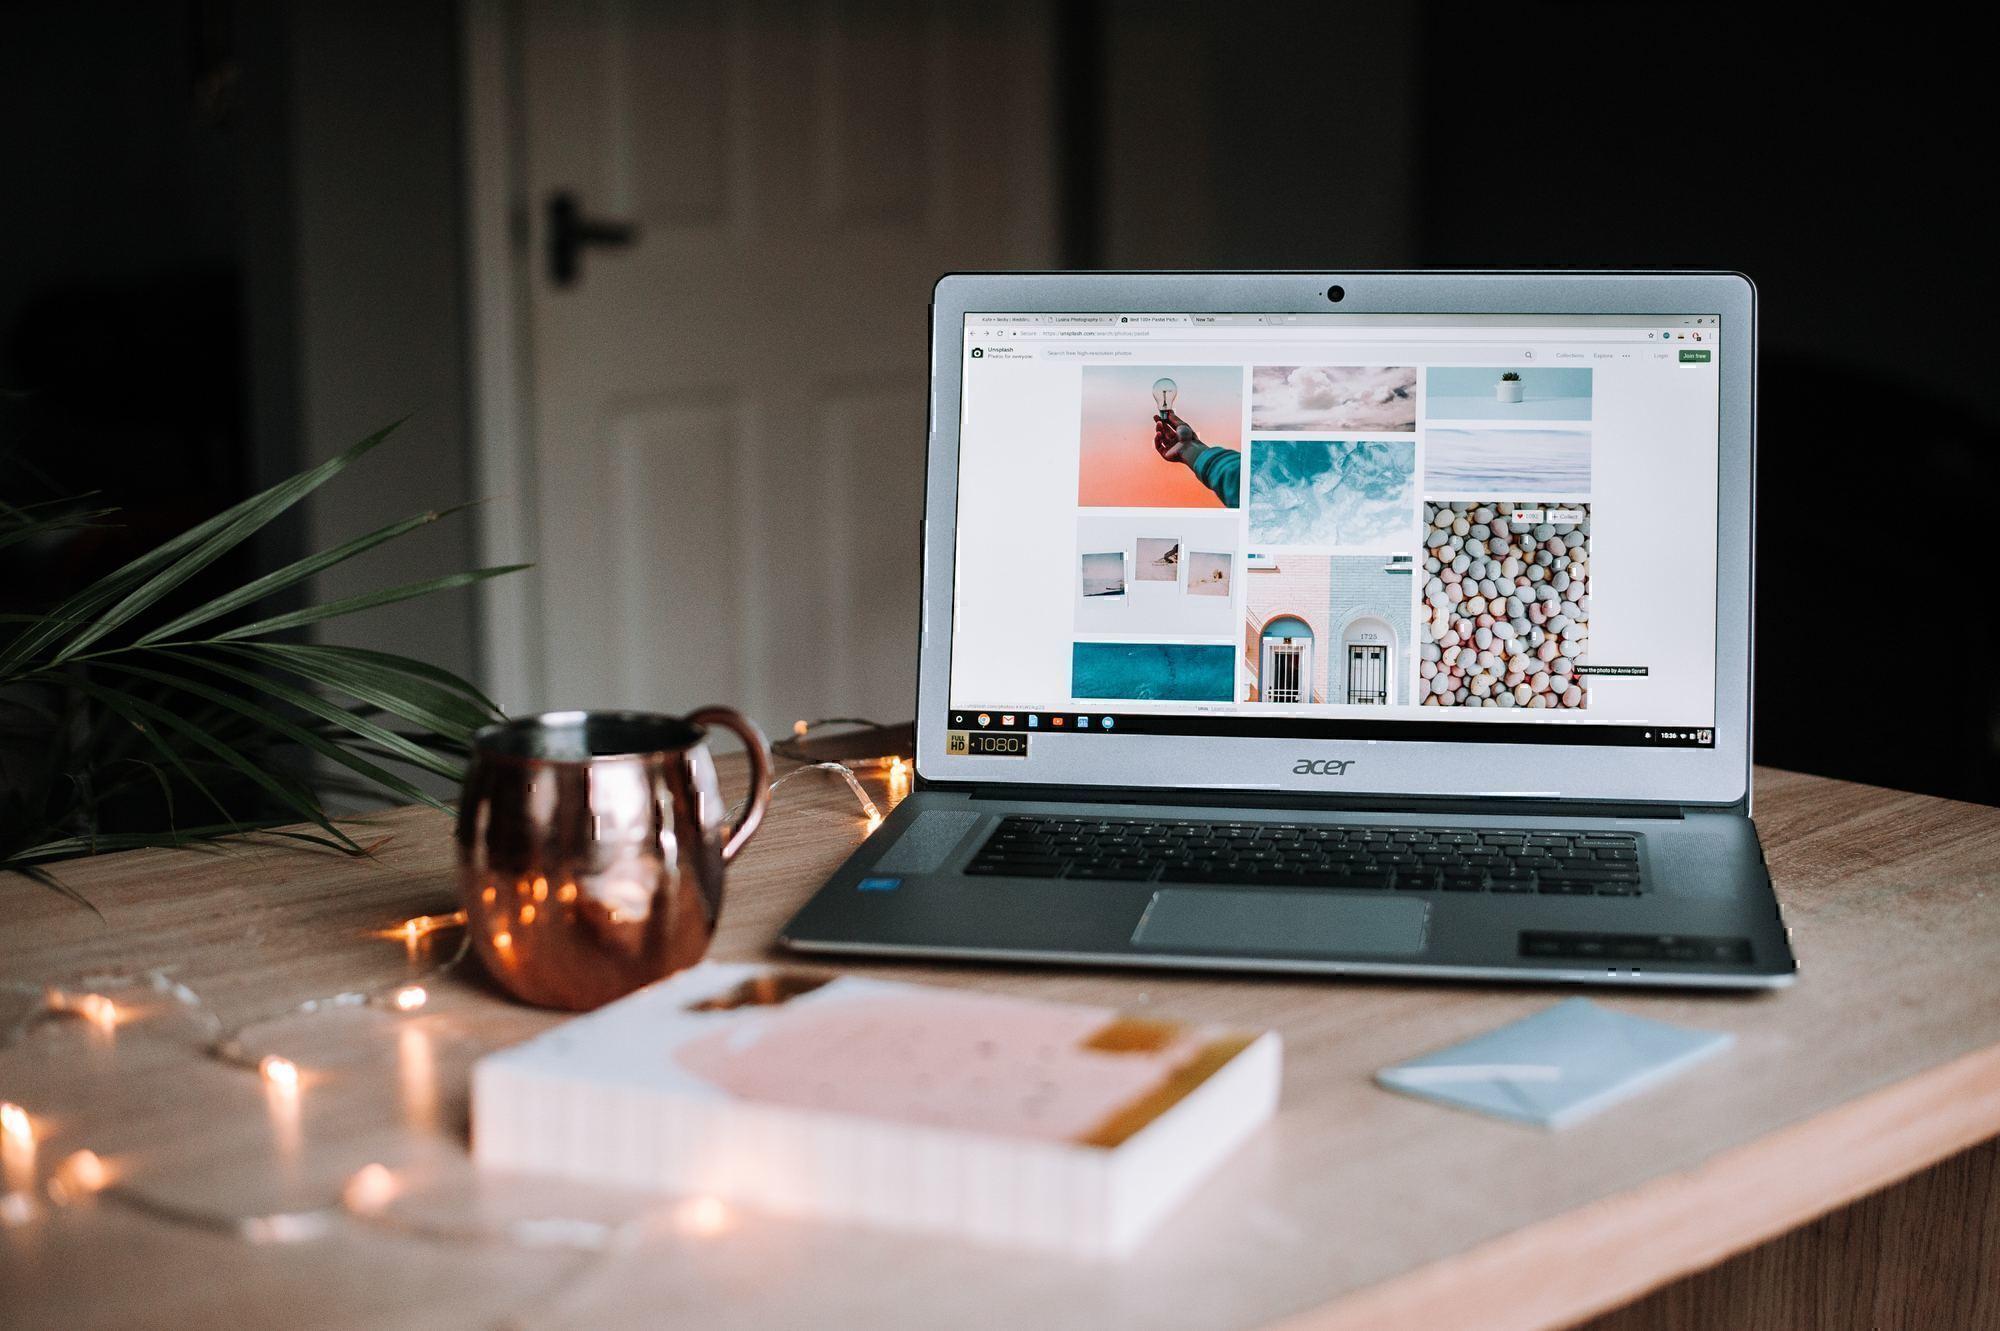 a computer sits on a table with a mug